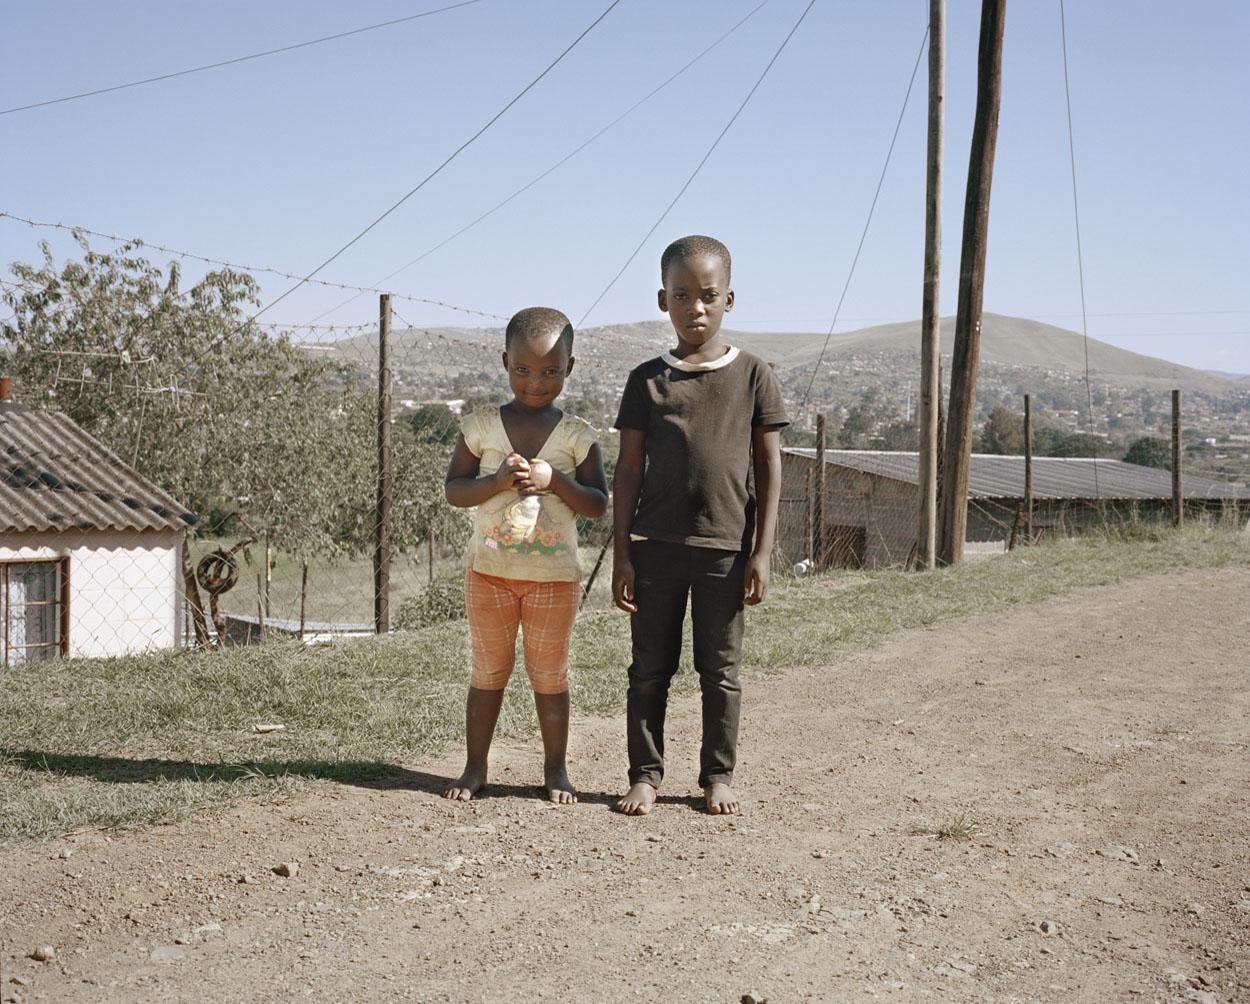 Simphiwe Thandeka, Ashdown, Pietermaritzburg